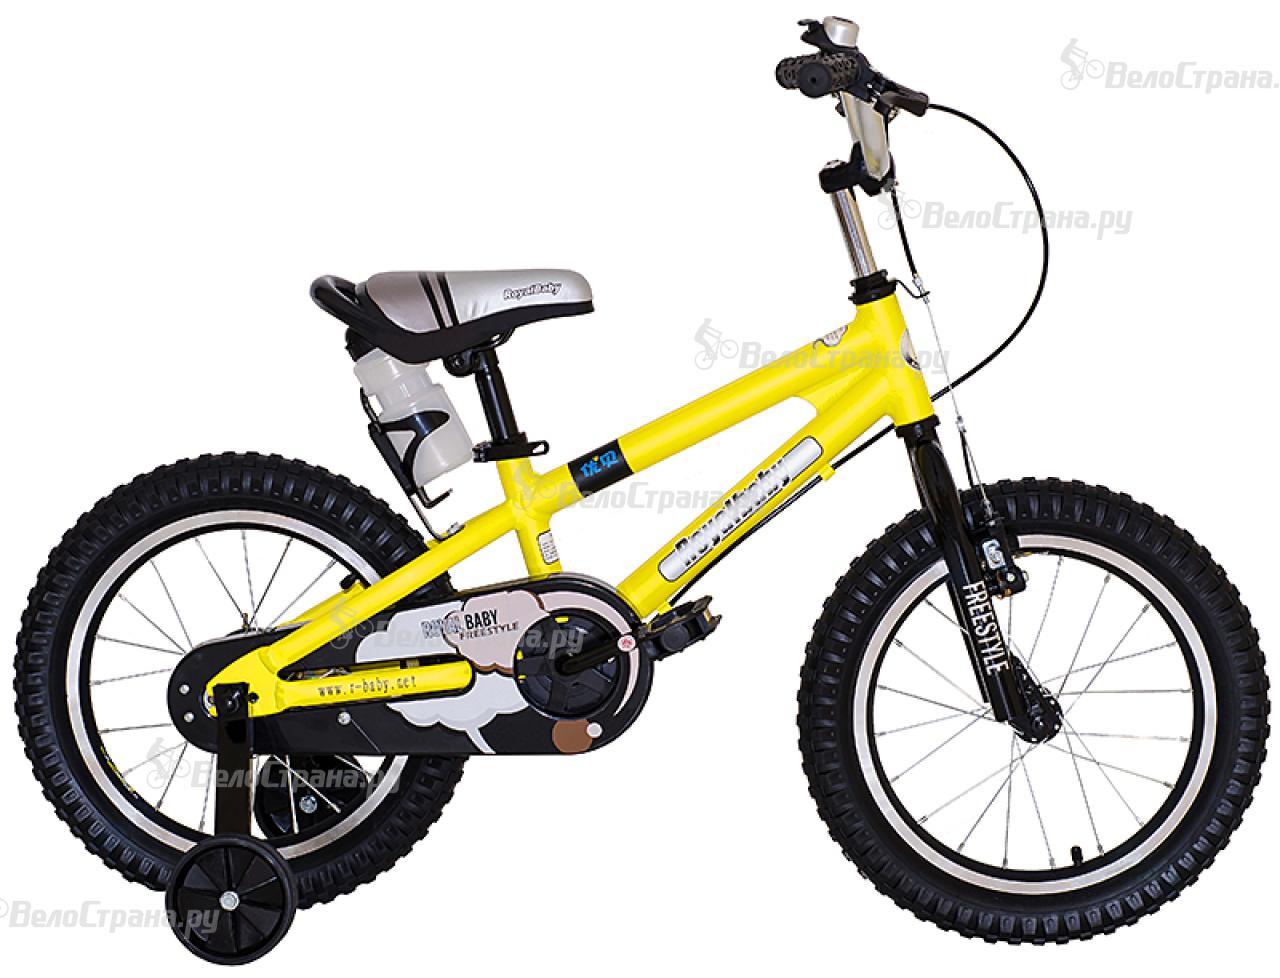 Велосипед Royal Baby Freestyle Alloy 18 (2018) велосипед royal baby buttons alloy 14 2018